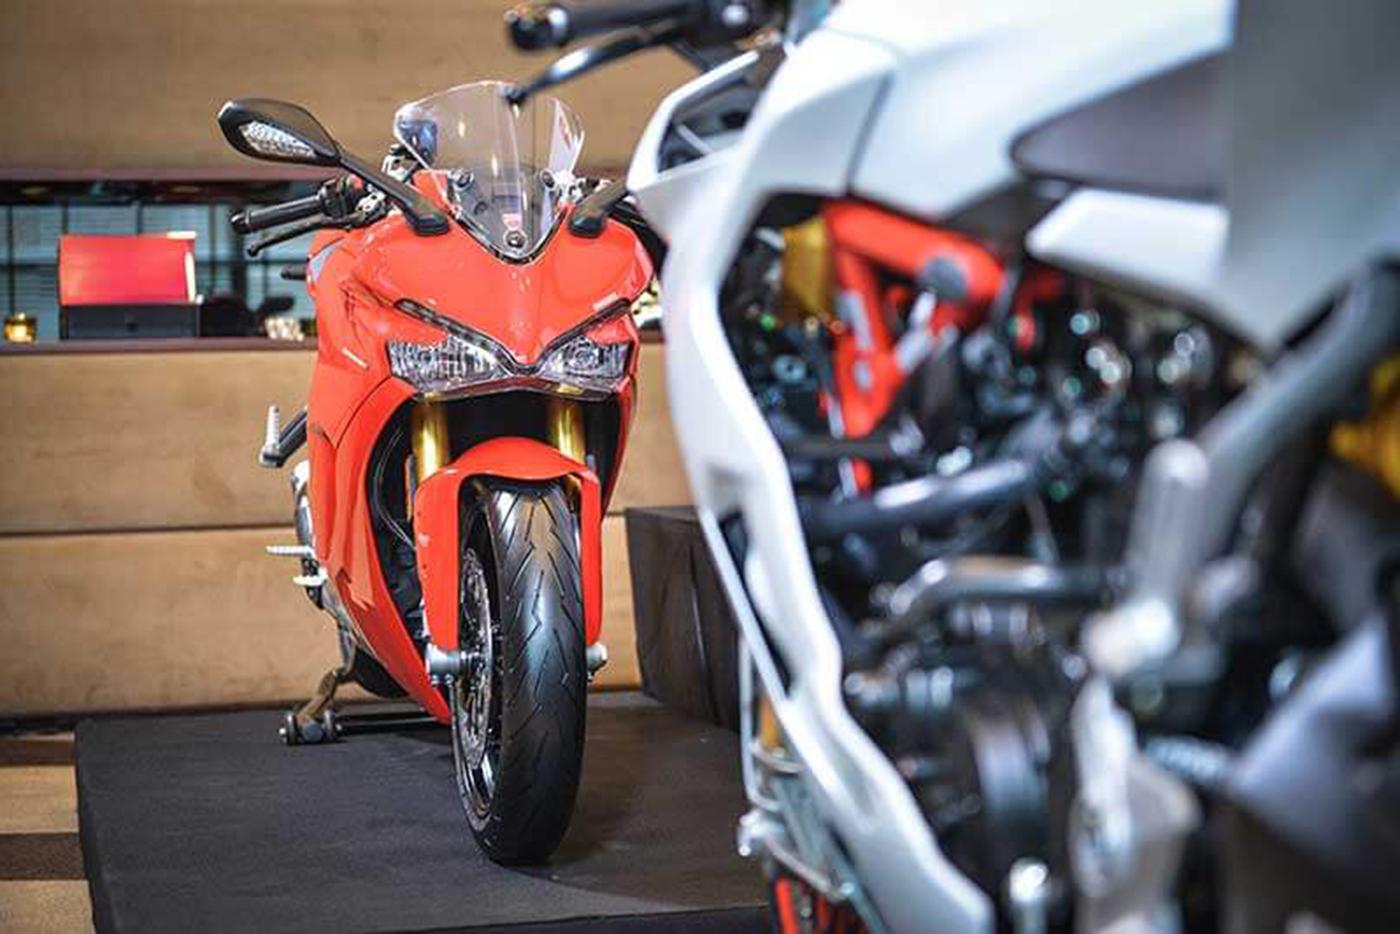 Ducati SuperSport 2017 – Đối thủ Kawasaki Ninja 1000 sắp về Việt Nam - ảnh 2